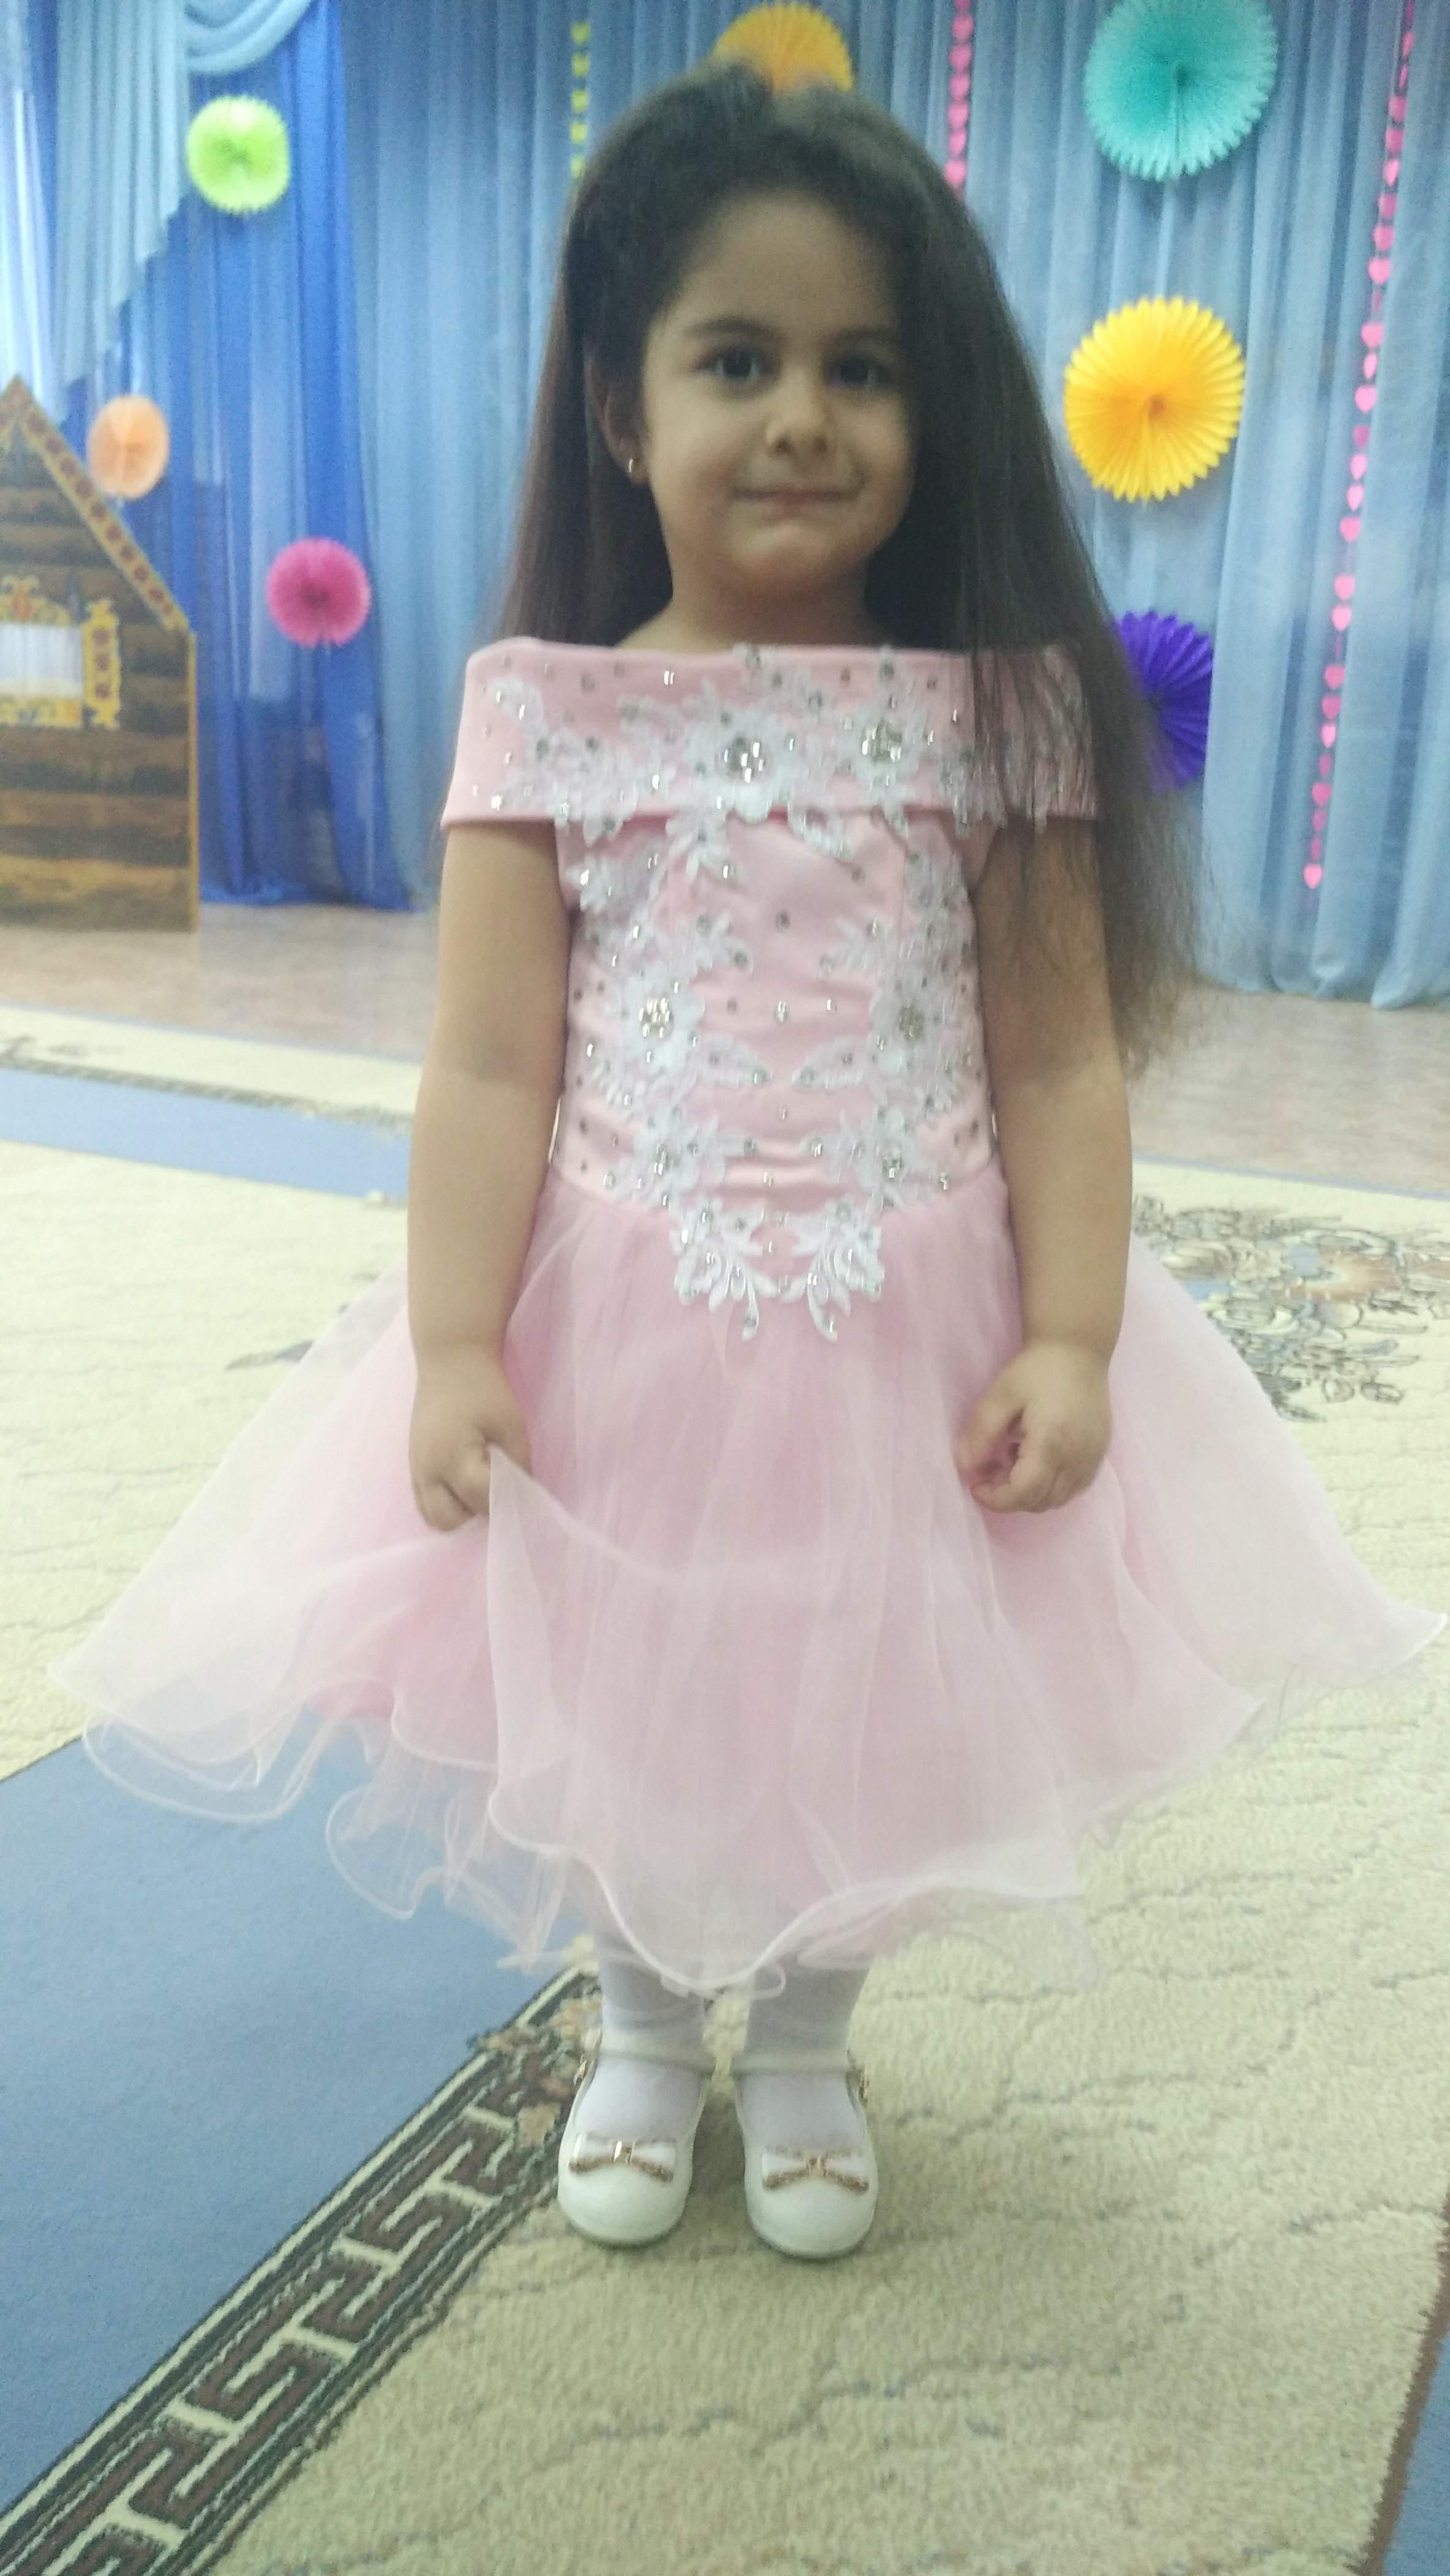 Рузи 4 годика... будущая актриса))). Выход в свет